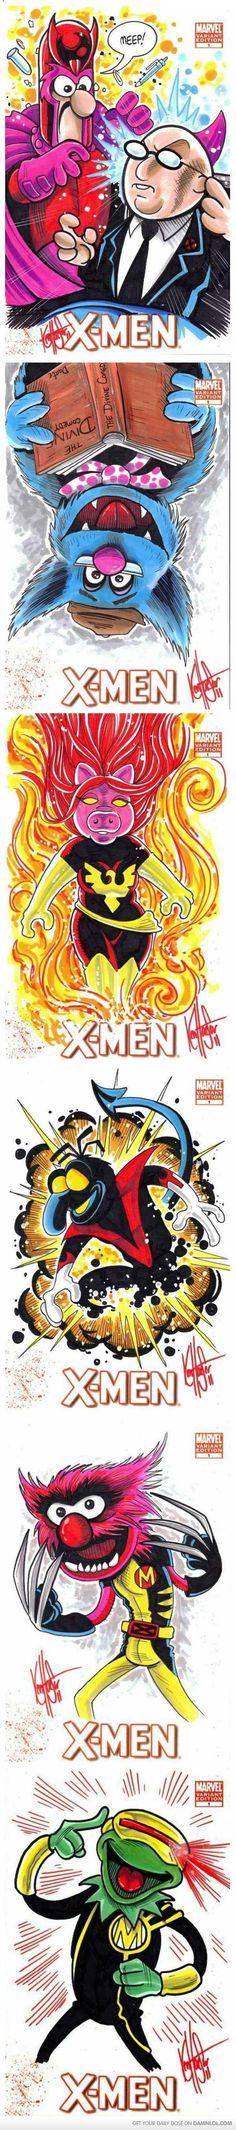 X-Men Muppets Edition - by Ken Haeser